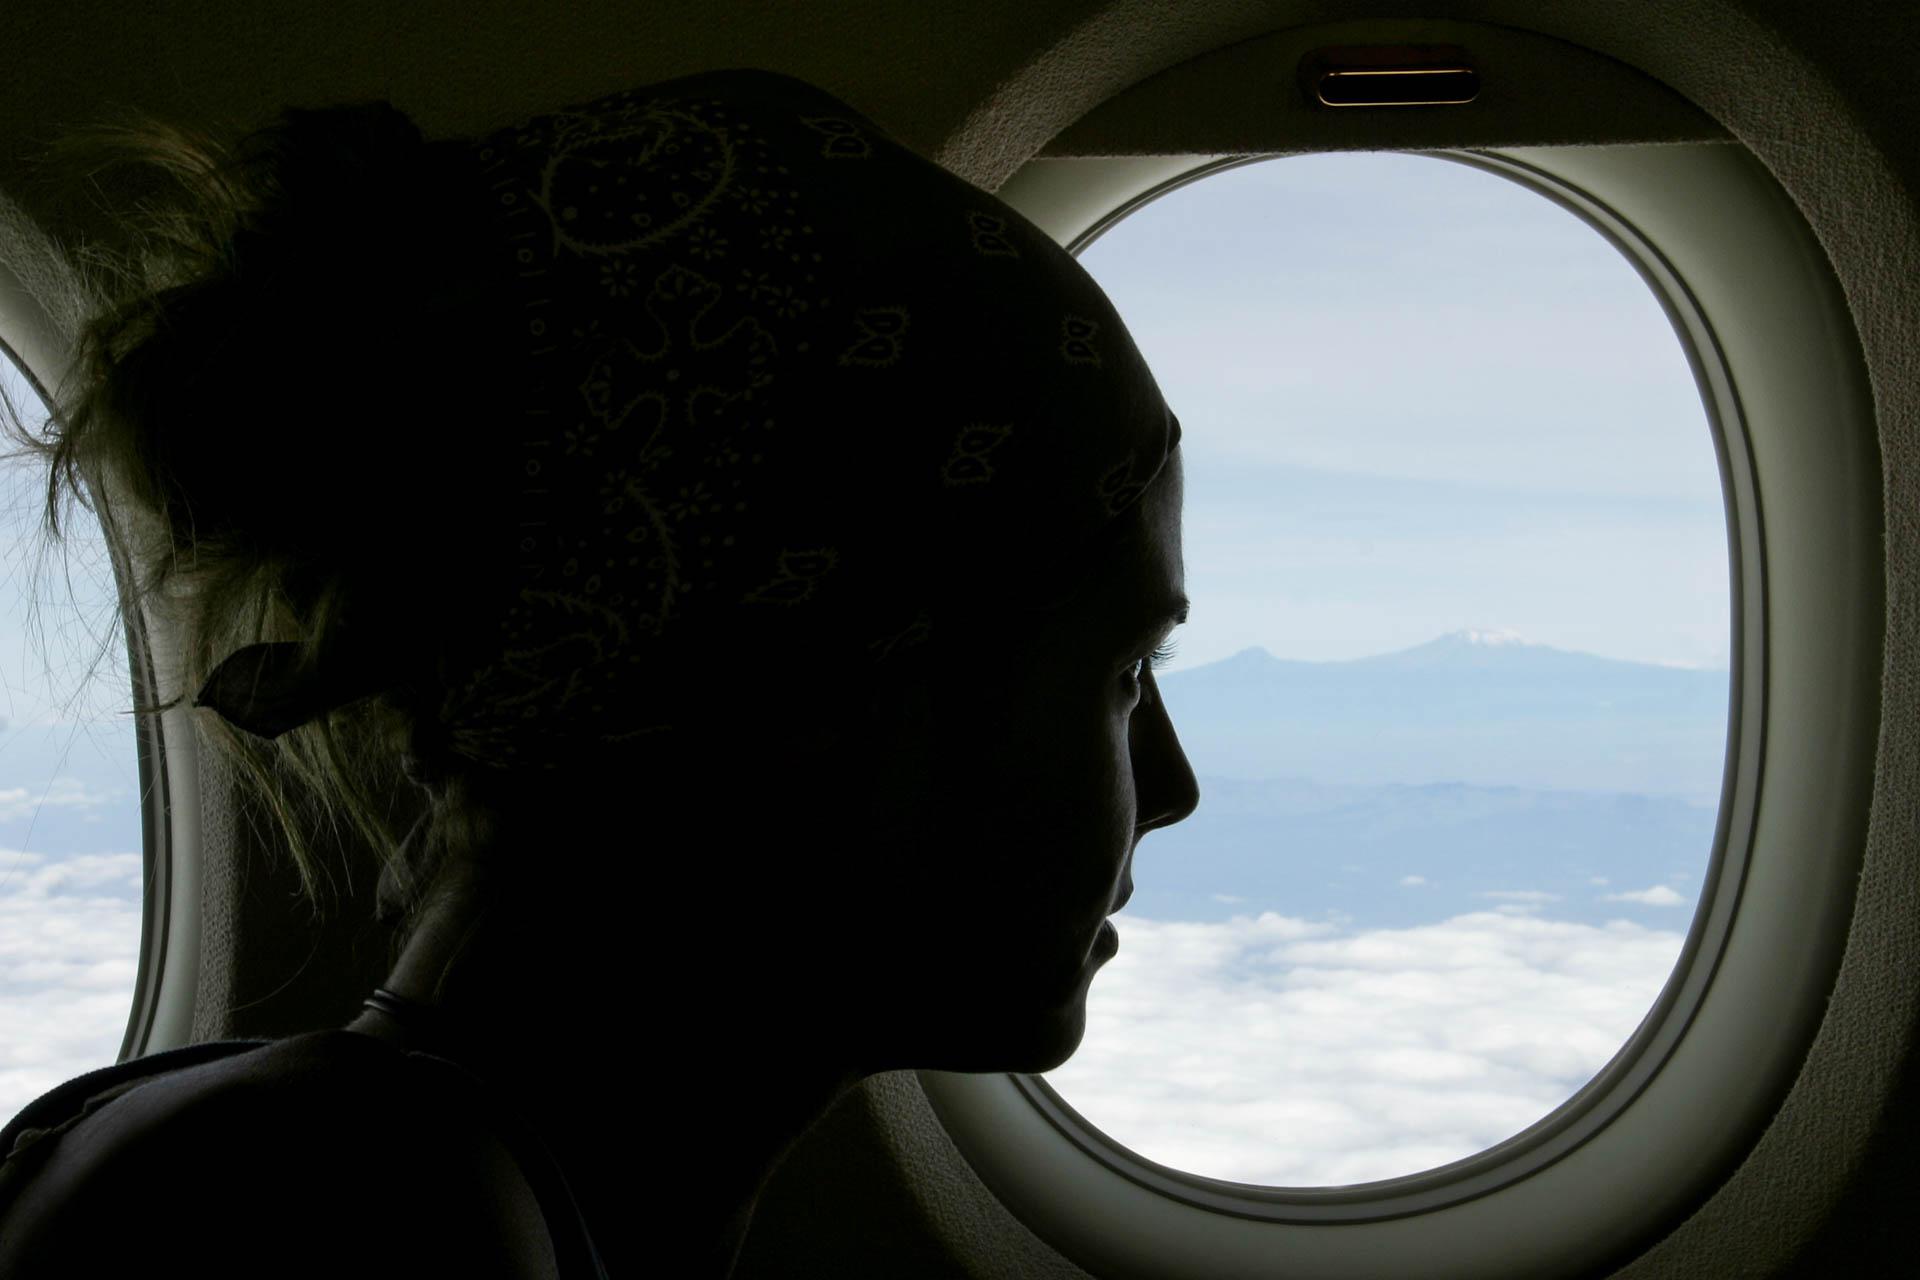 Planning towards Masai Mara, a glance at the Kilimangiaro.